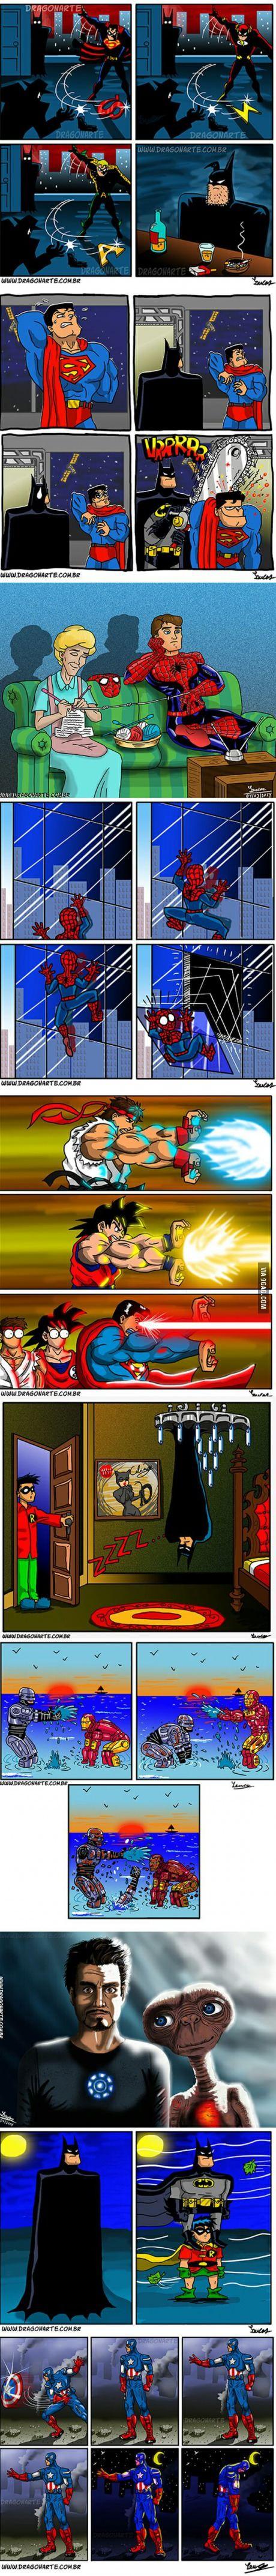 These Dragonarte Superhero Comics Wil Make you Laugh Hard